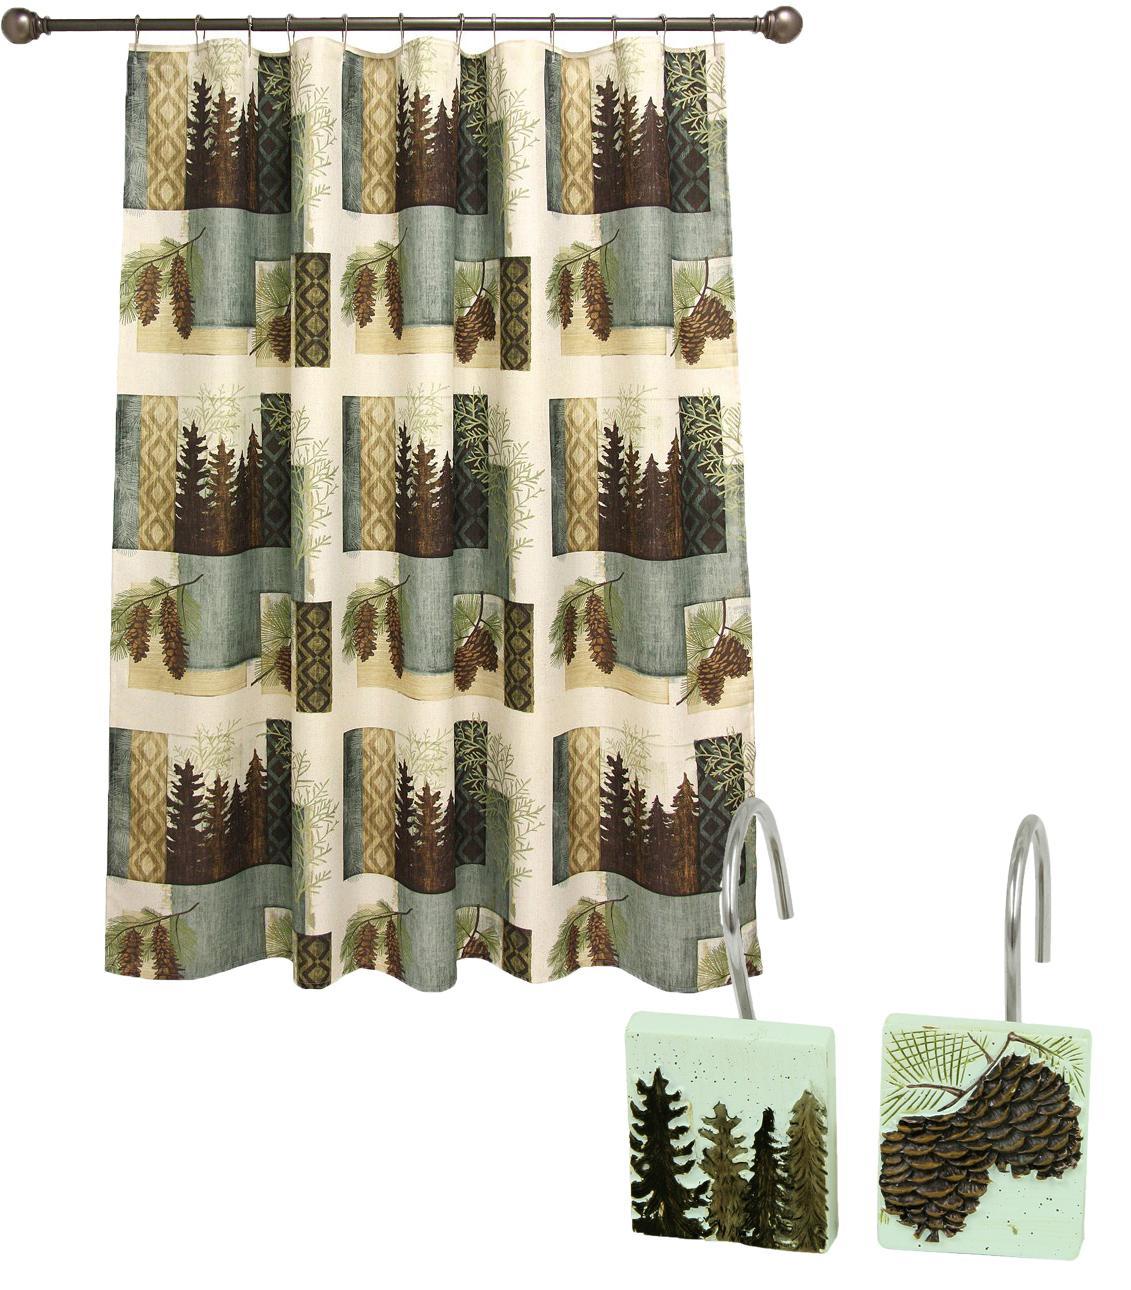 bacova guild westlake fabric shower curtain. Black Bedroom Furniture Sets. Home Design Ideas